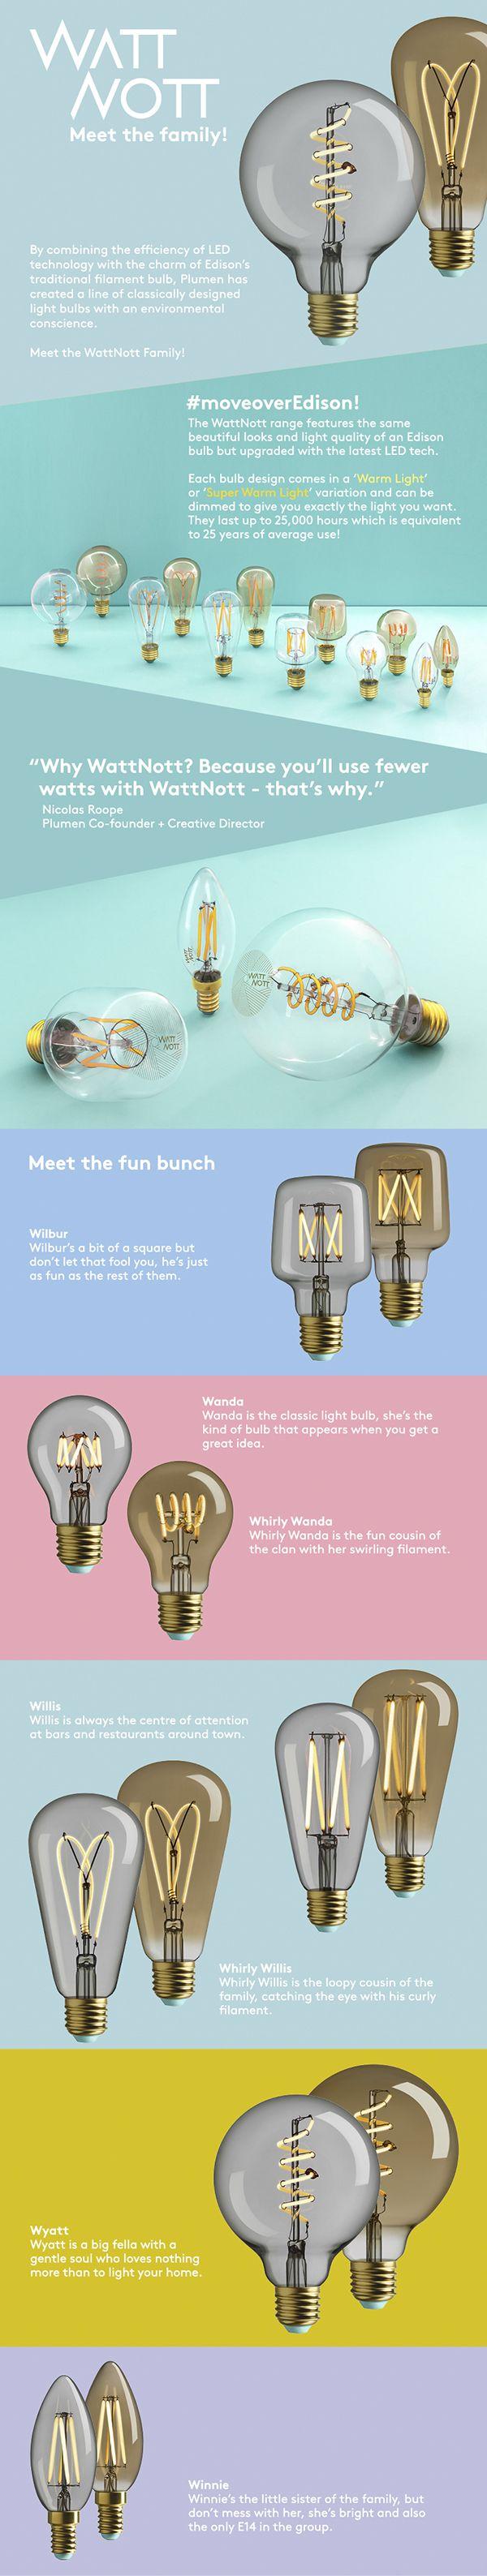 WattNott Filament LED Light Bulbs by Plumen